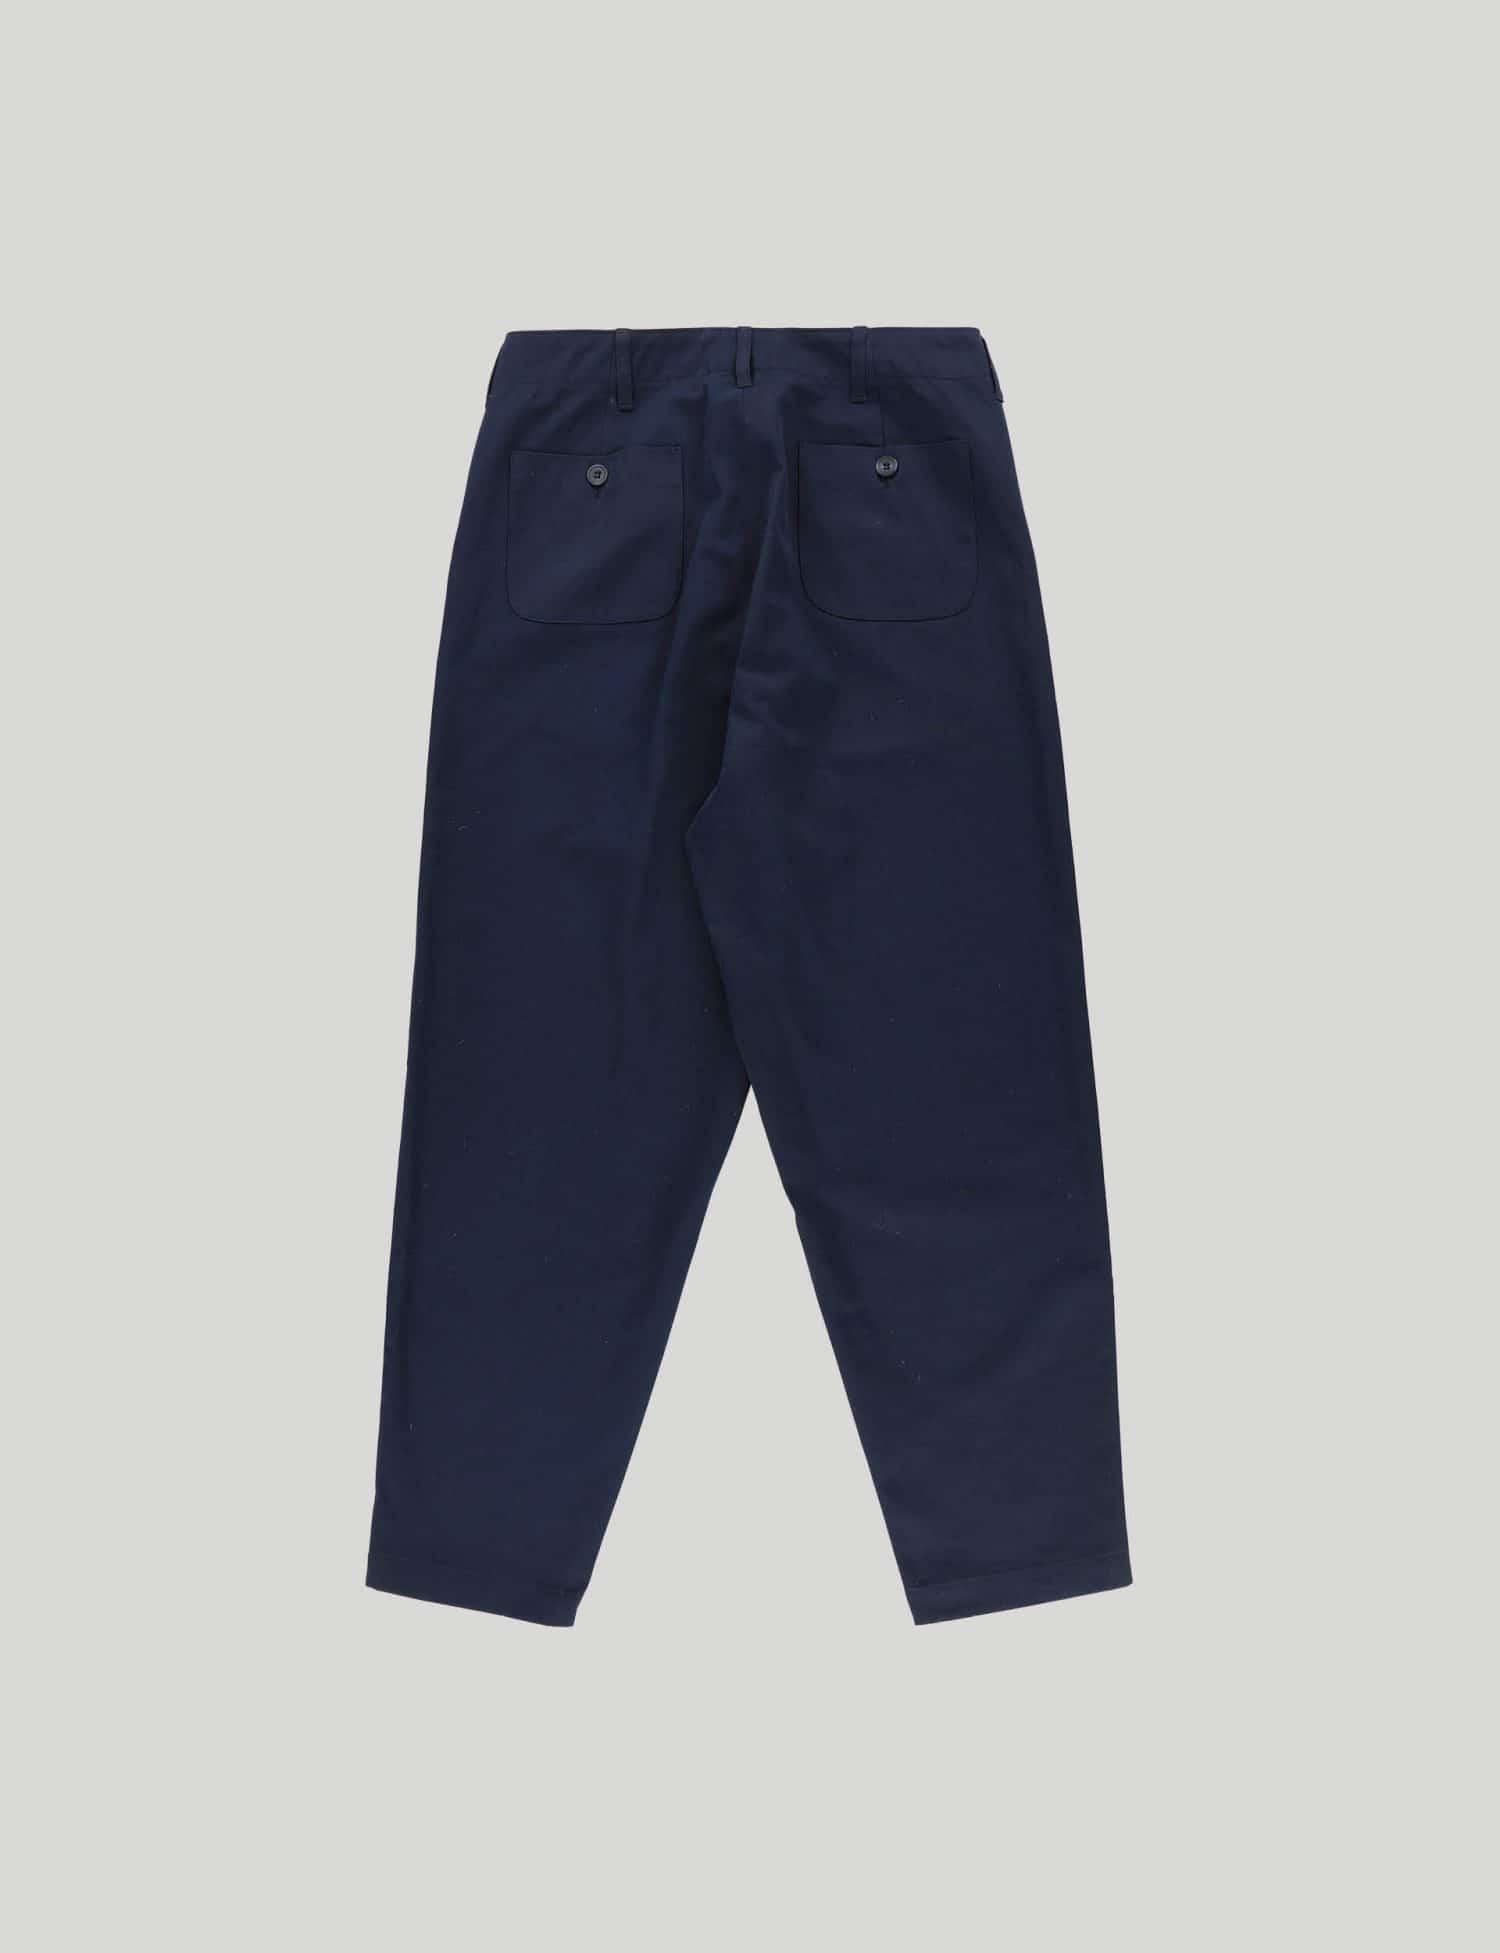 Castart - Beachspider Trouser - Navy Blue